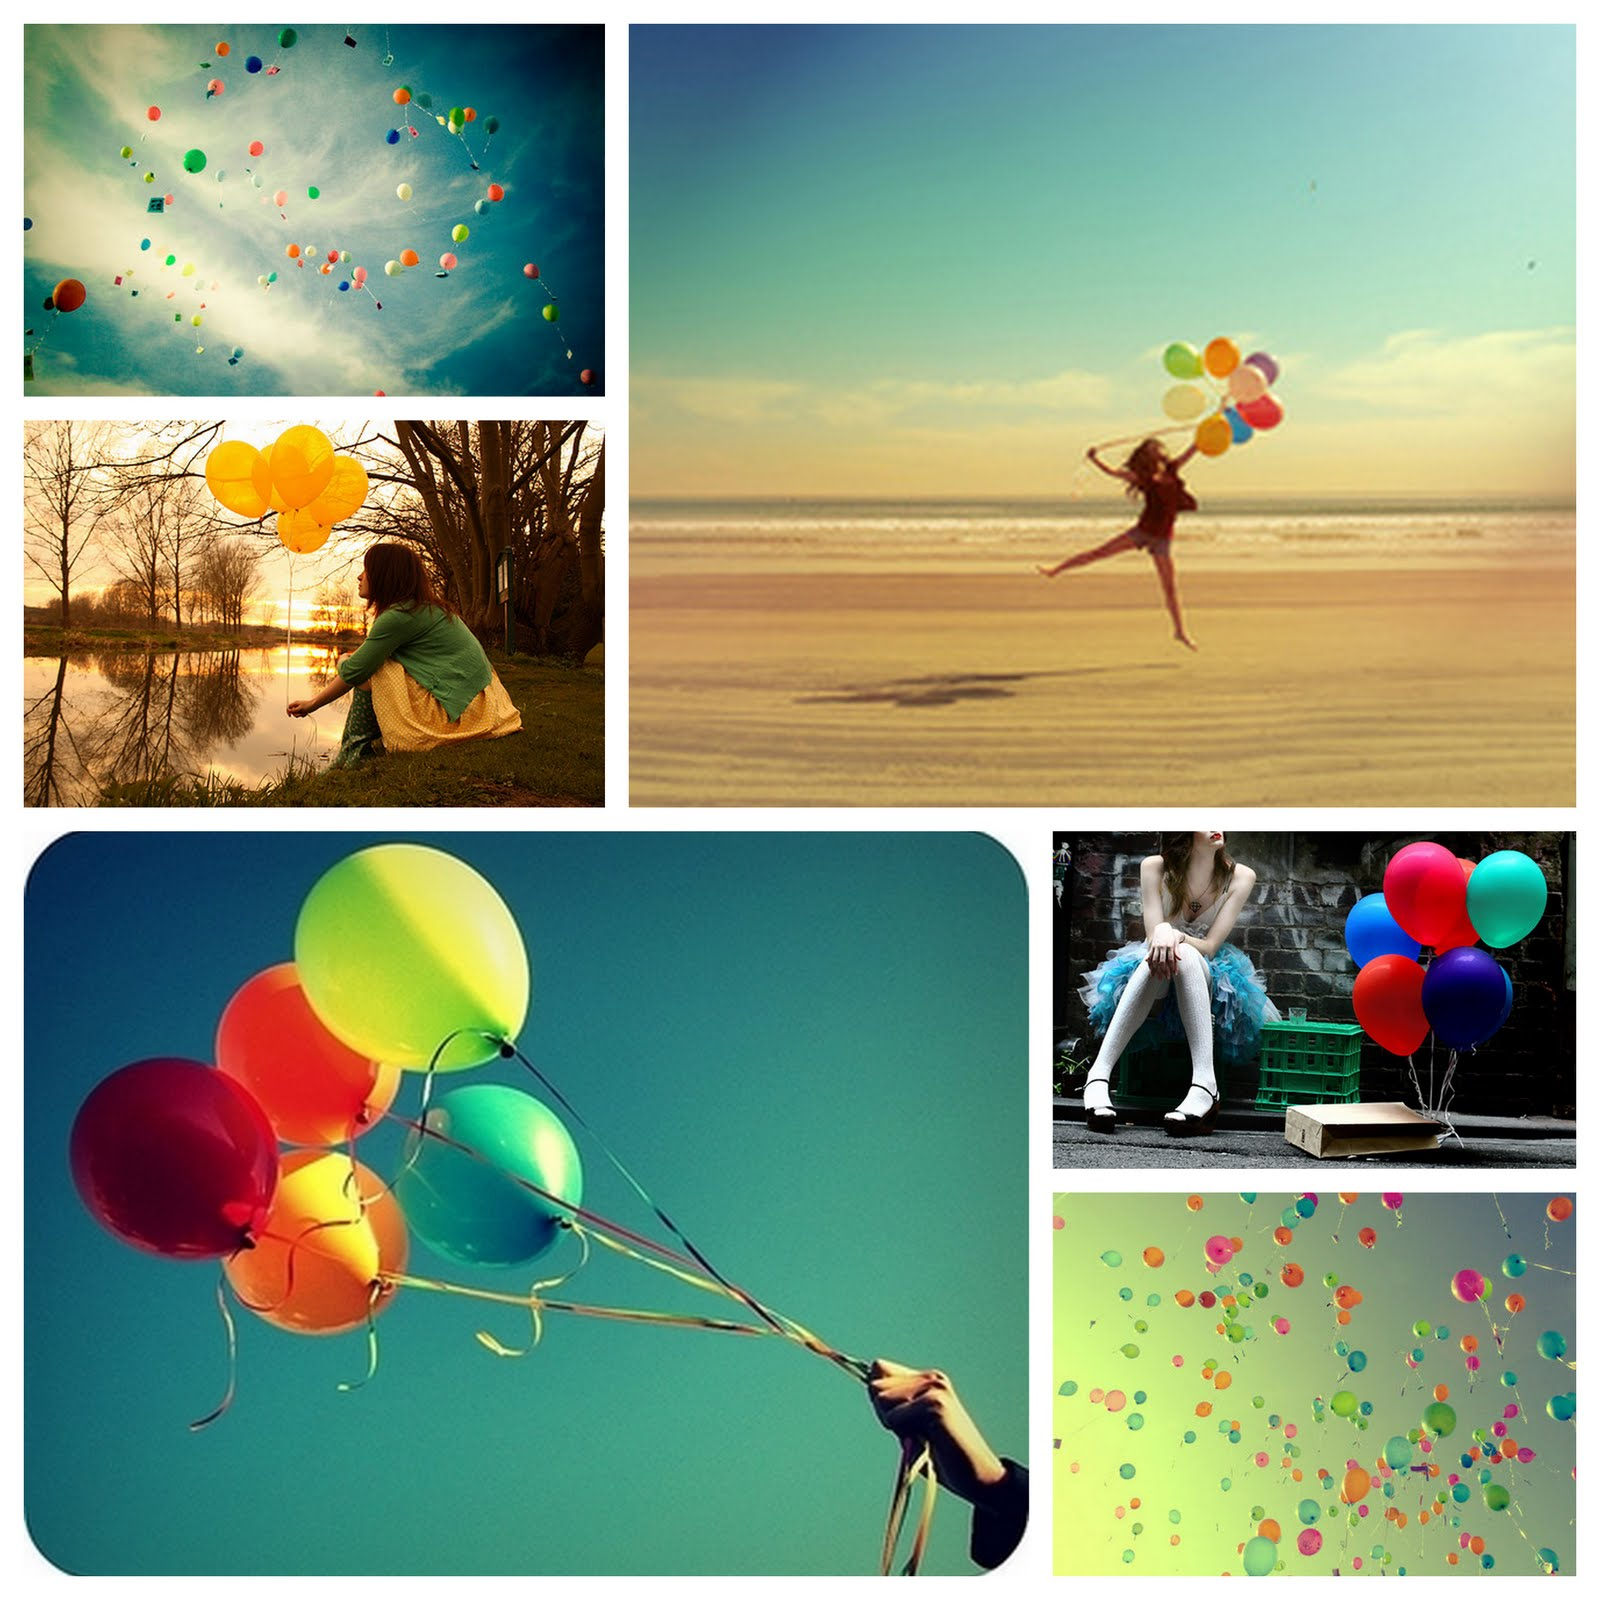 http://1.bp.blogspot.com/_lnmiK_oRKZk/S9tQZOu_hKI/AAAAAAAAAmA/y9B7HkeFwXU/s1600/balloons.jpg